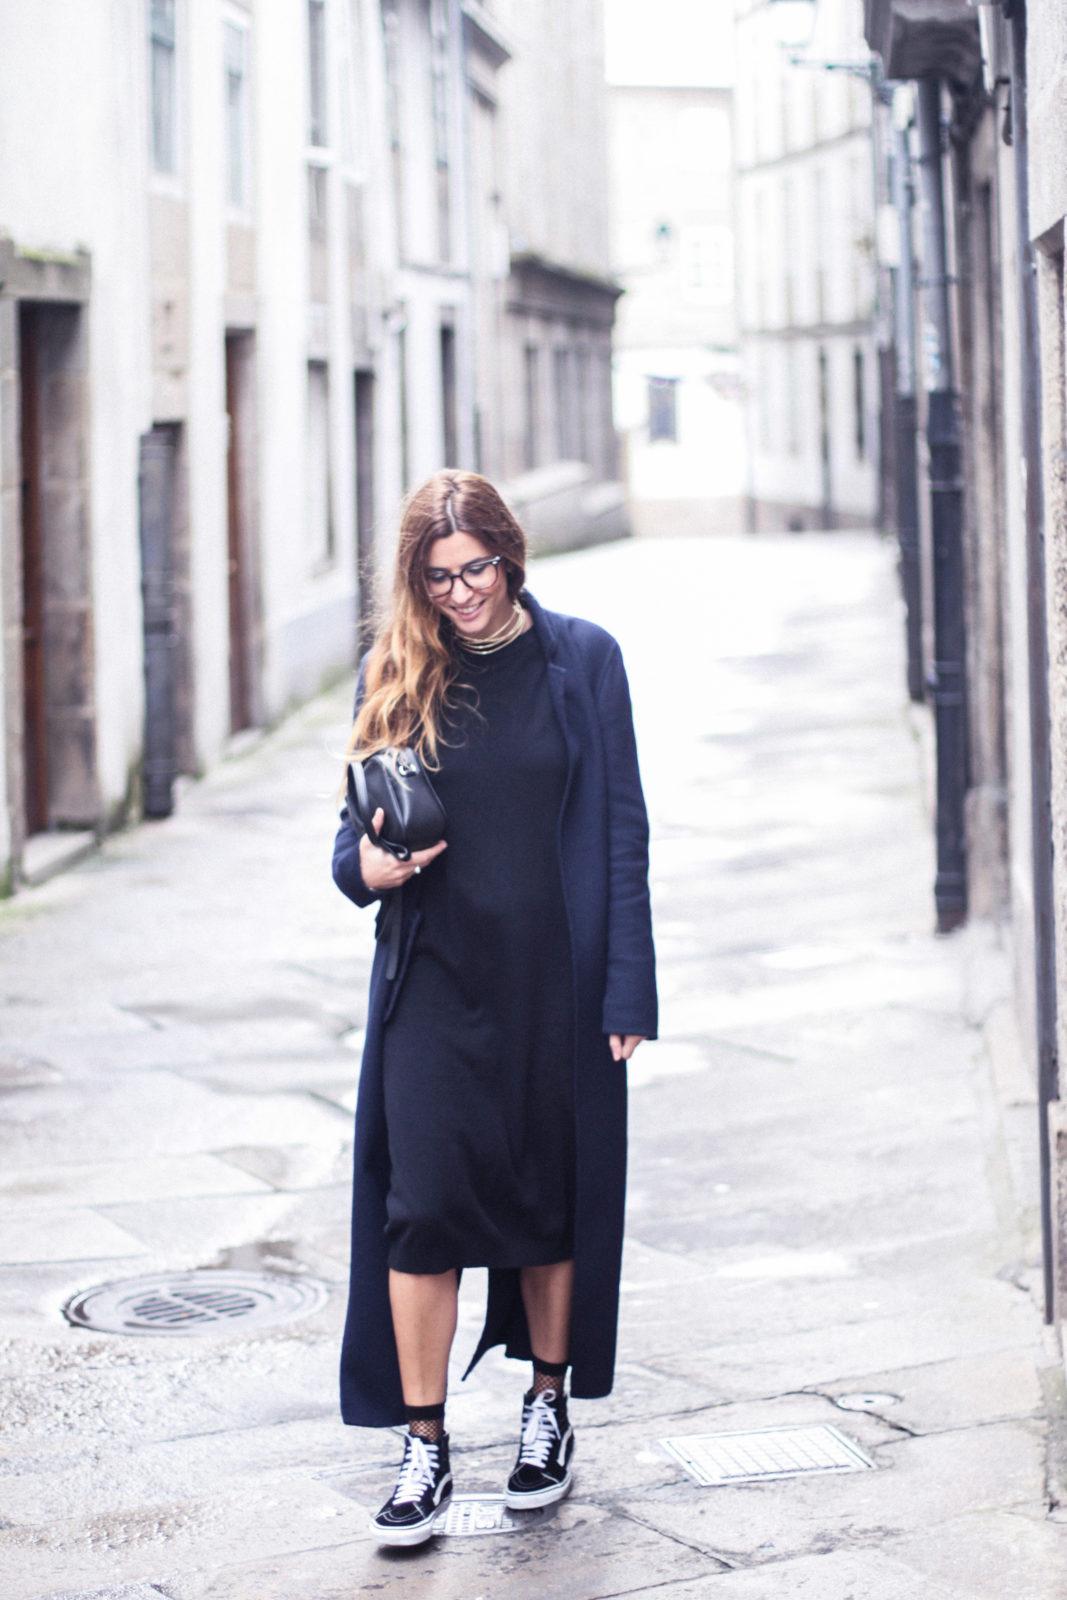 vestido_de_punto_midi_vans_calcetines_rejilla_choker_metalico_happiness_boutique_abrigo_largo_gucci_street_style_fall_2016_donkeycool-31